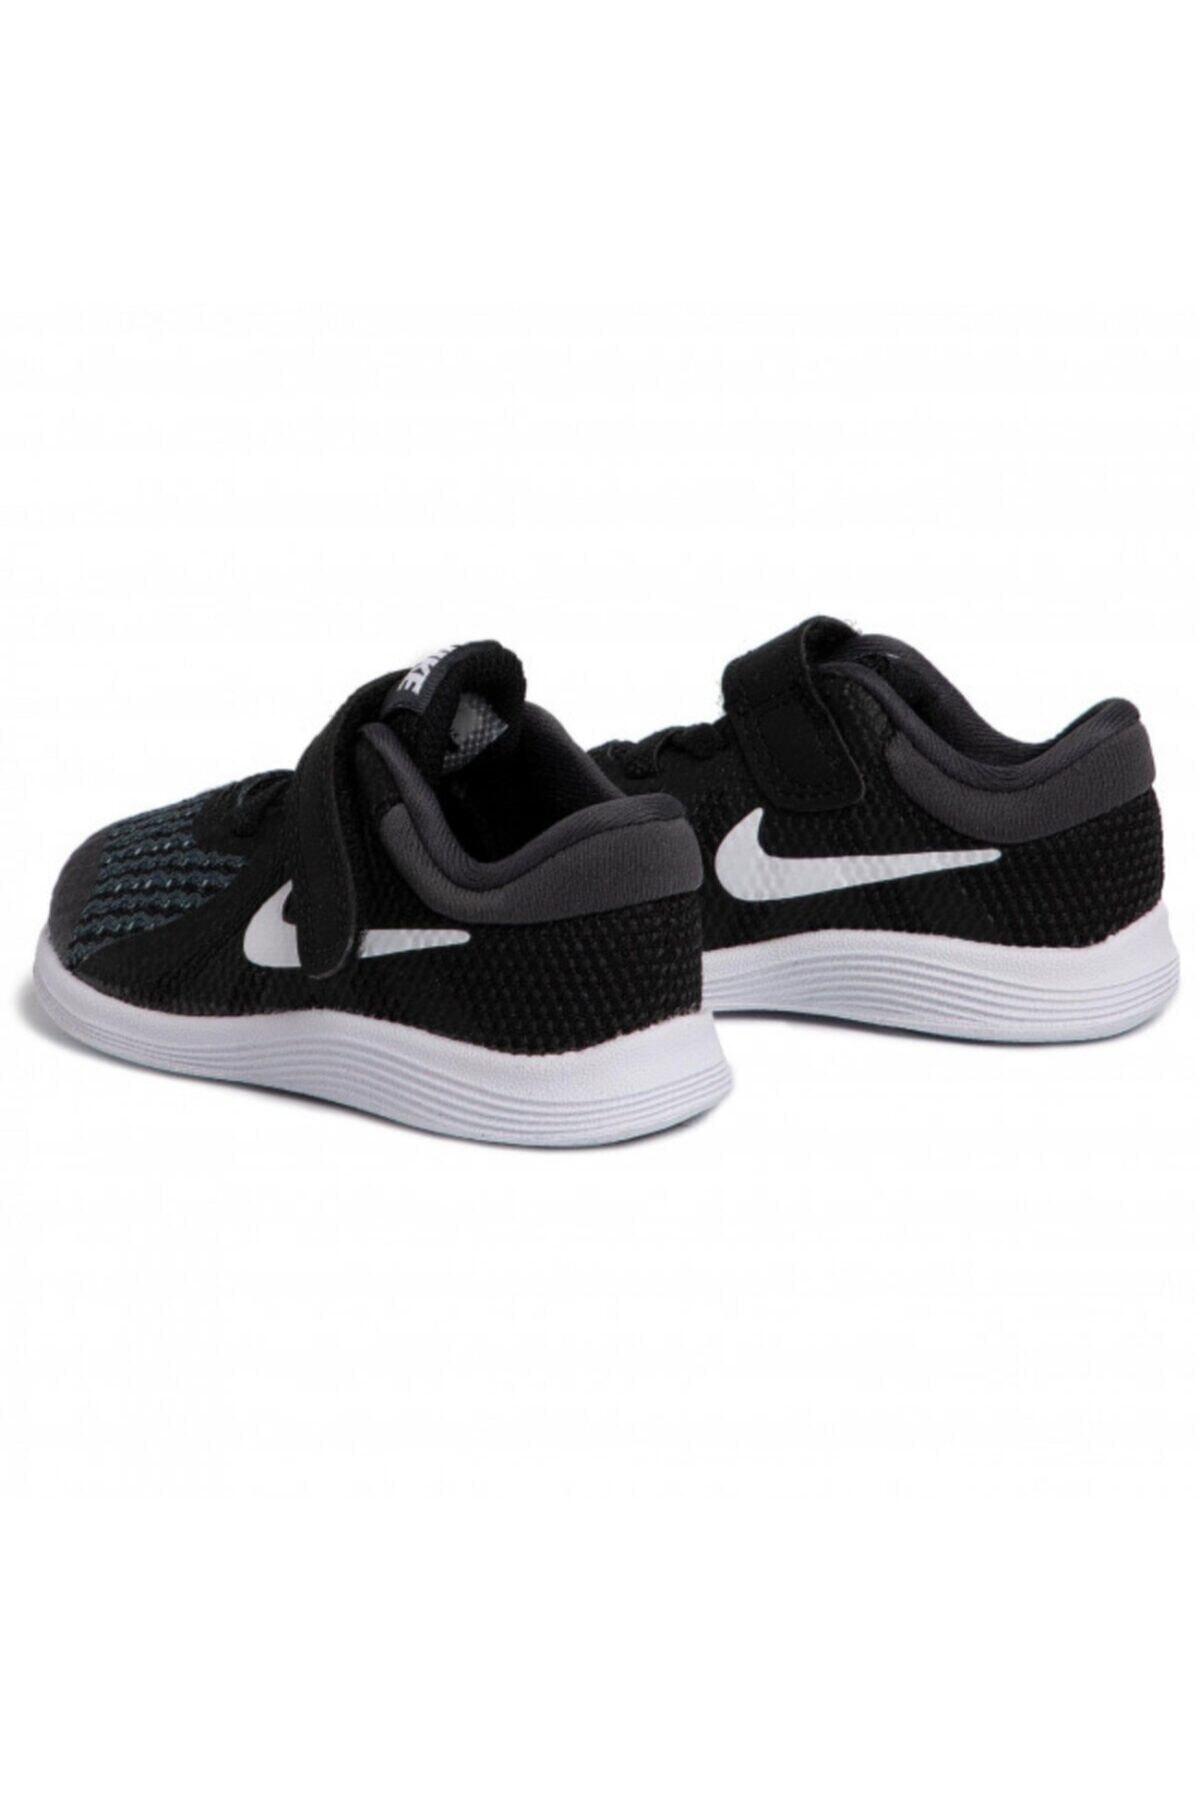 Nike Kids Bebek Siyah Koşu Ayakkabı 943304-006 2